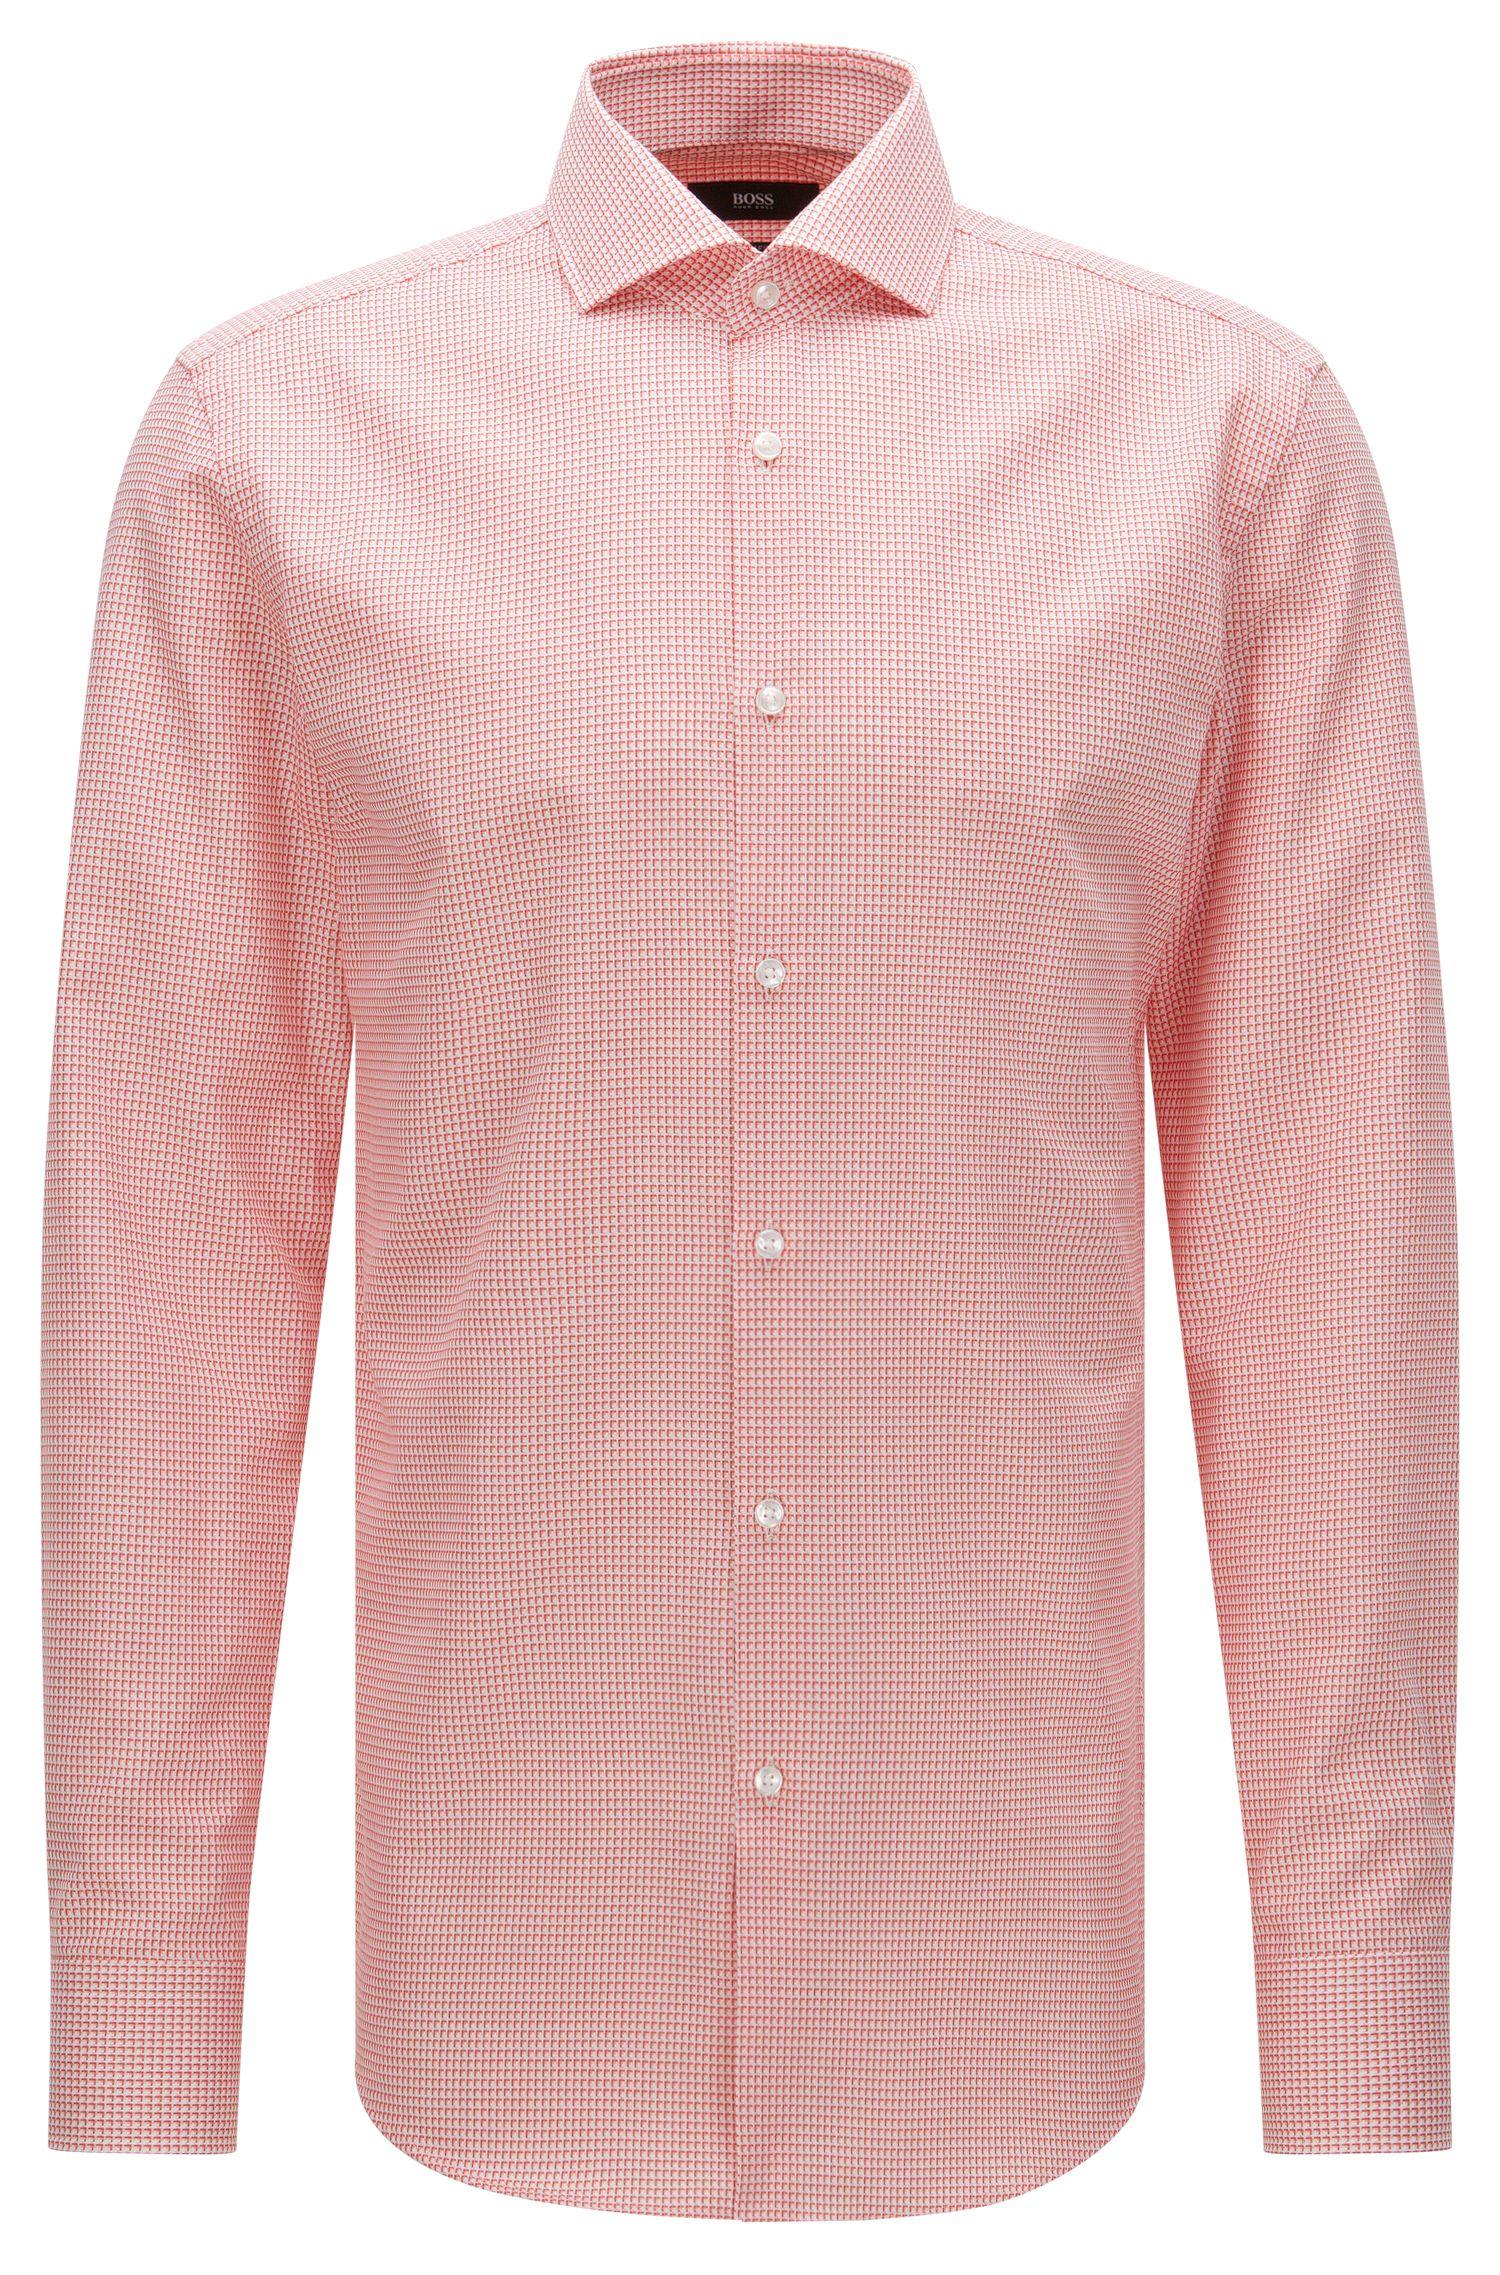 Gemustertes Slim-Fit Hemd aus Baumwolle: 'Jason'